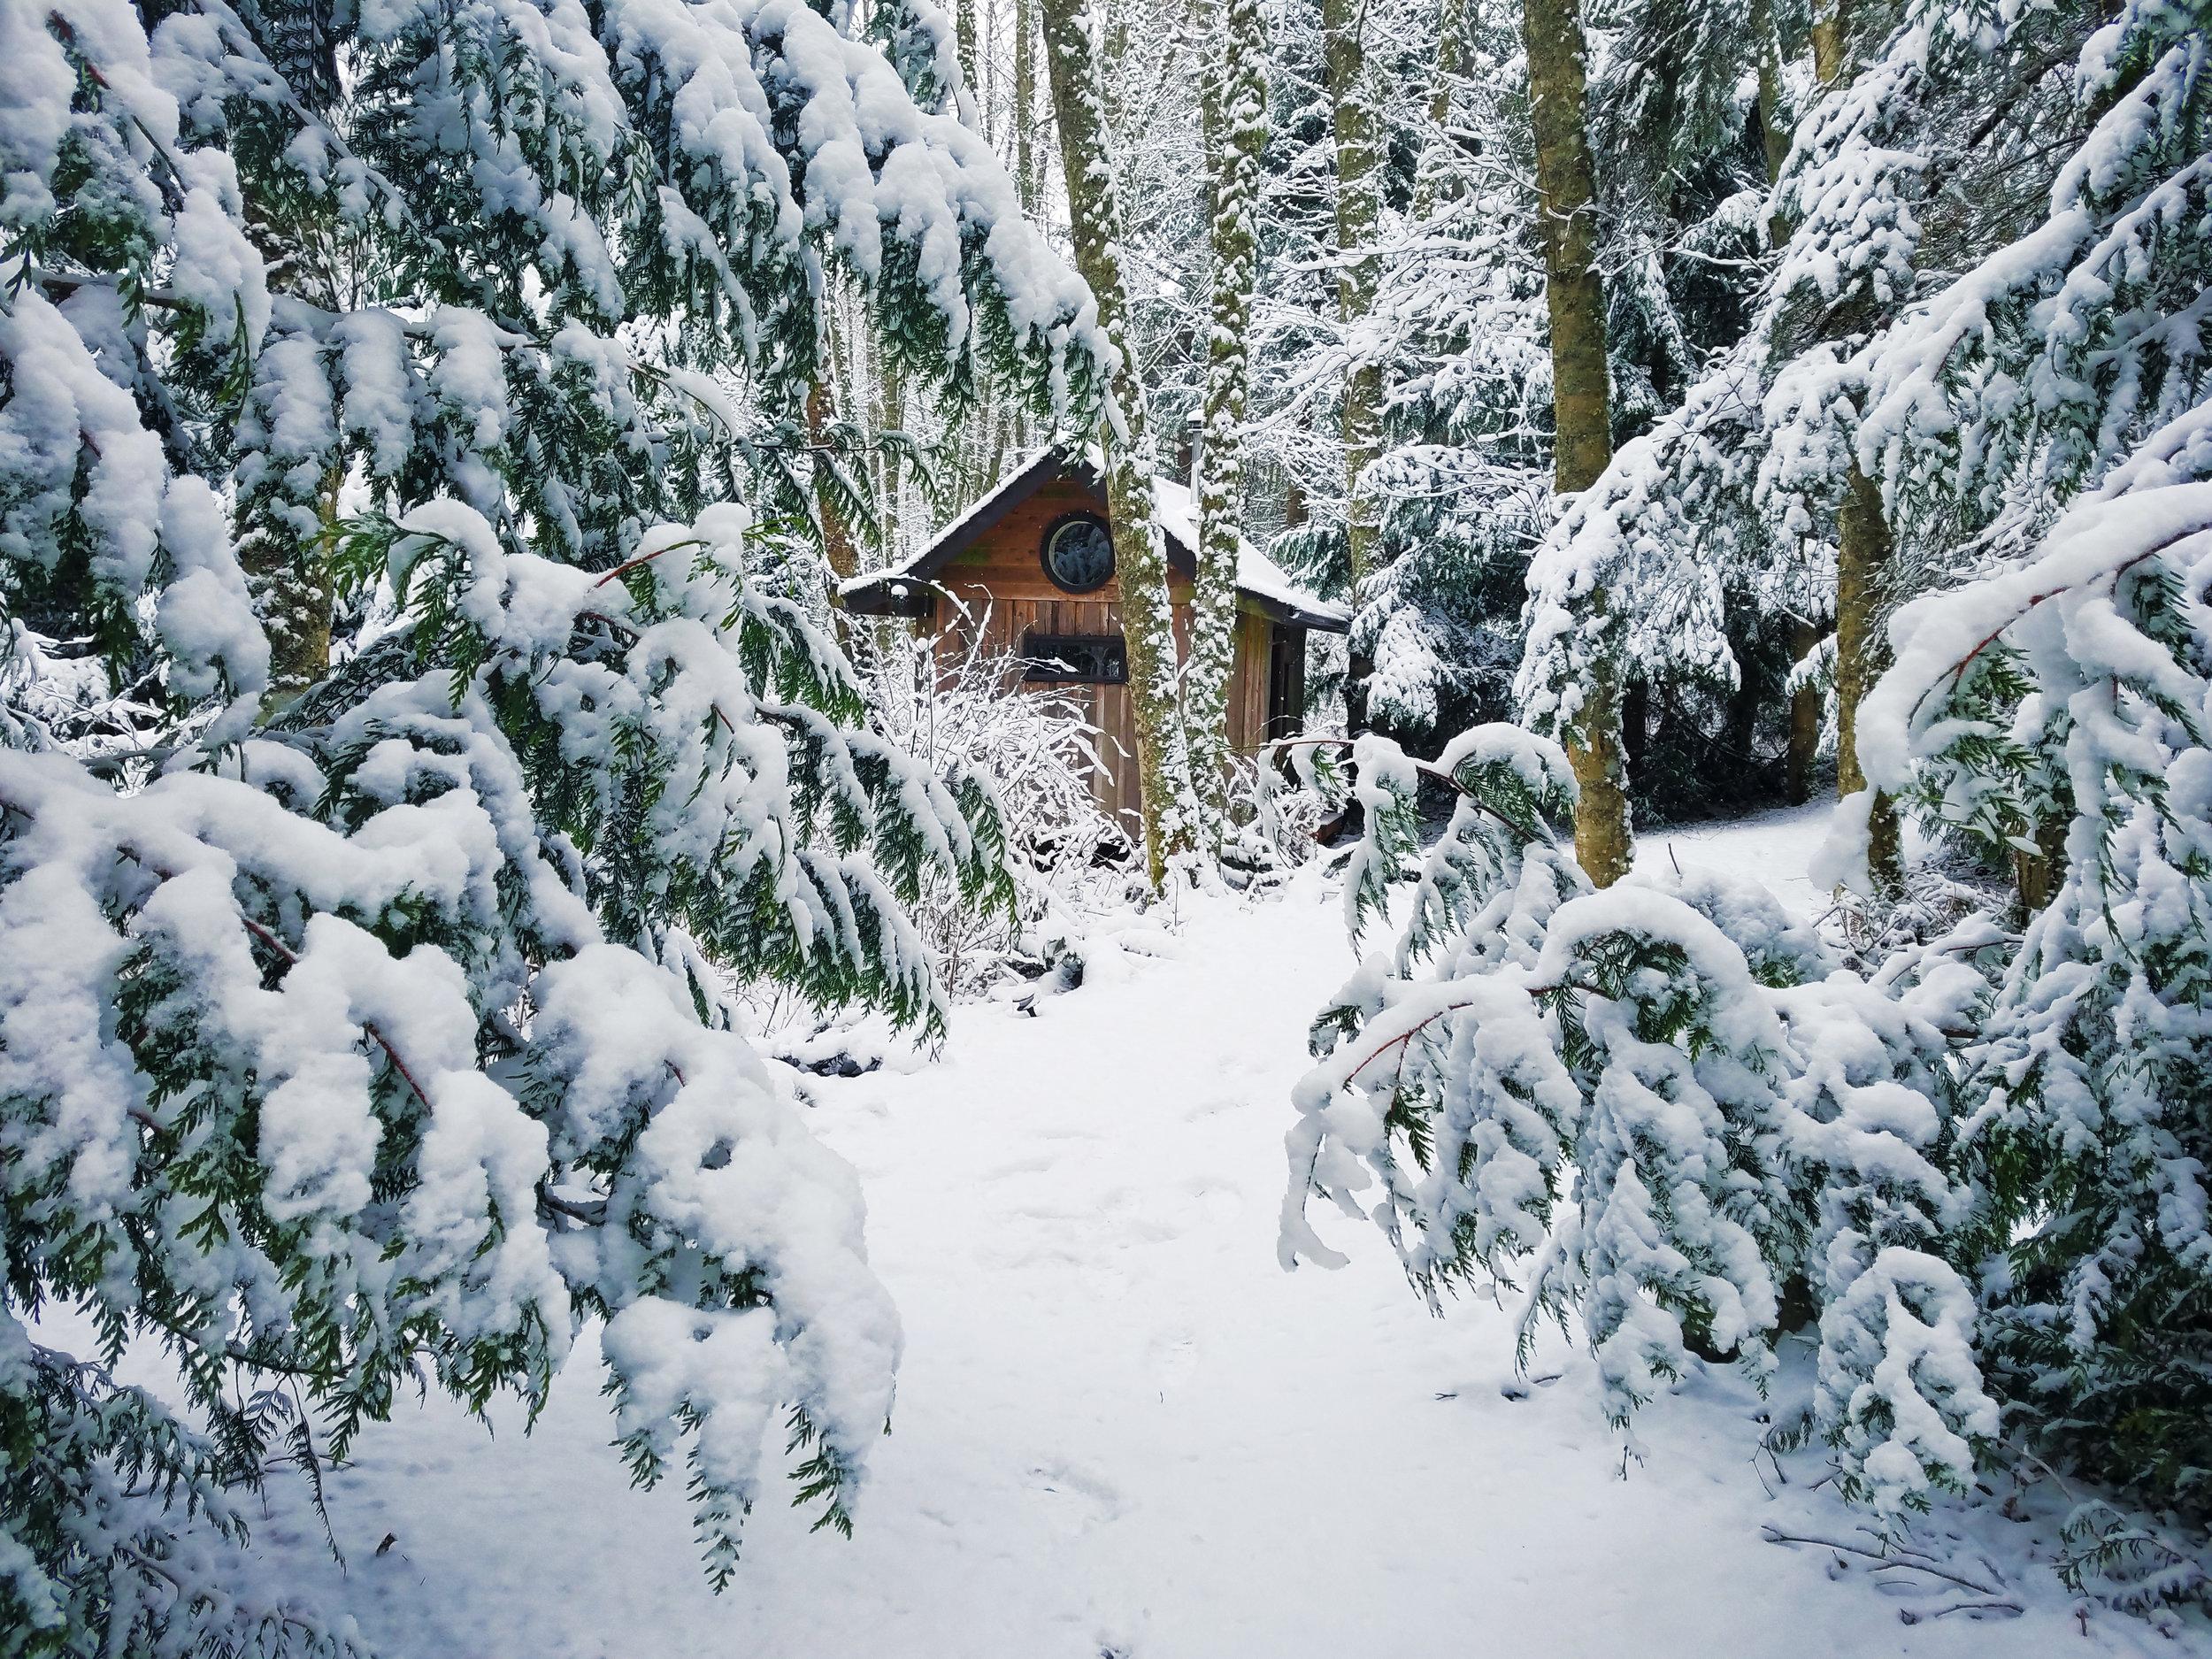 Winter Snow 7.jpg